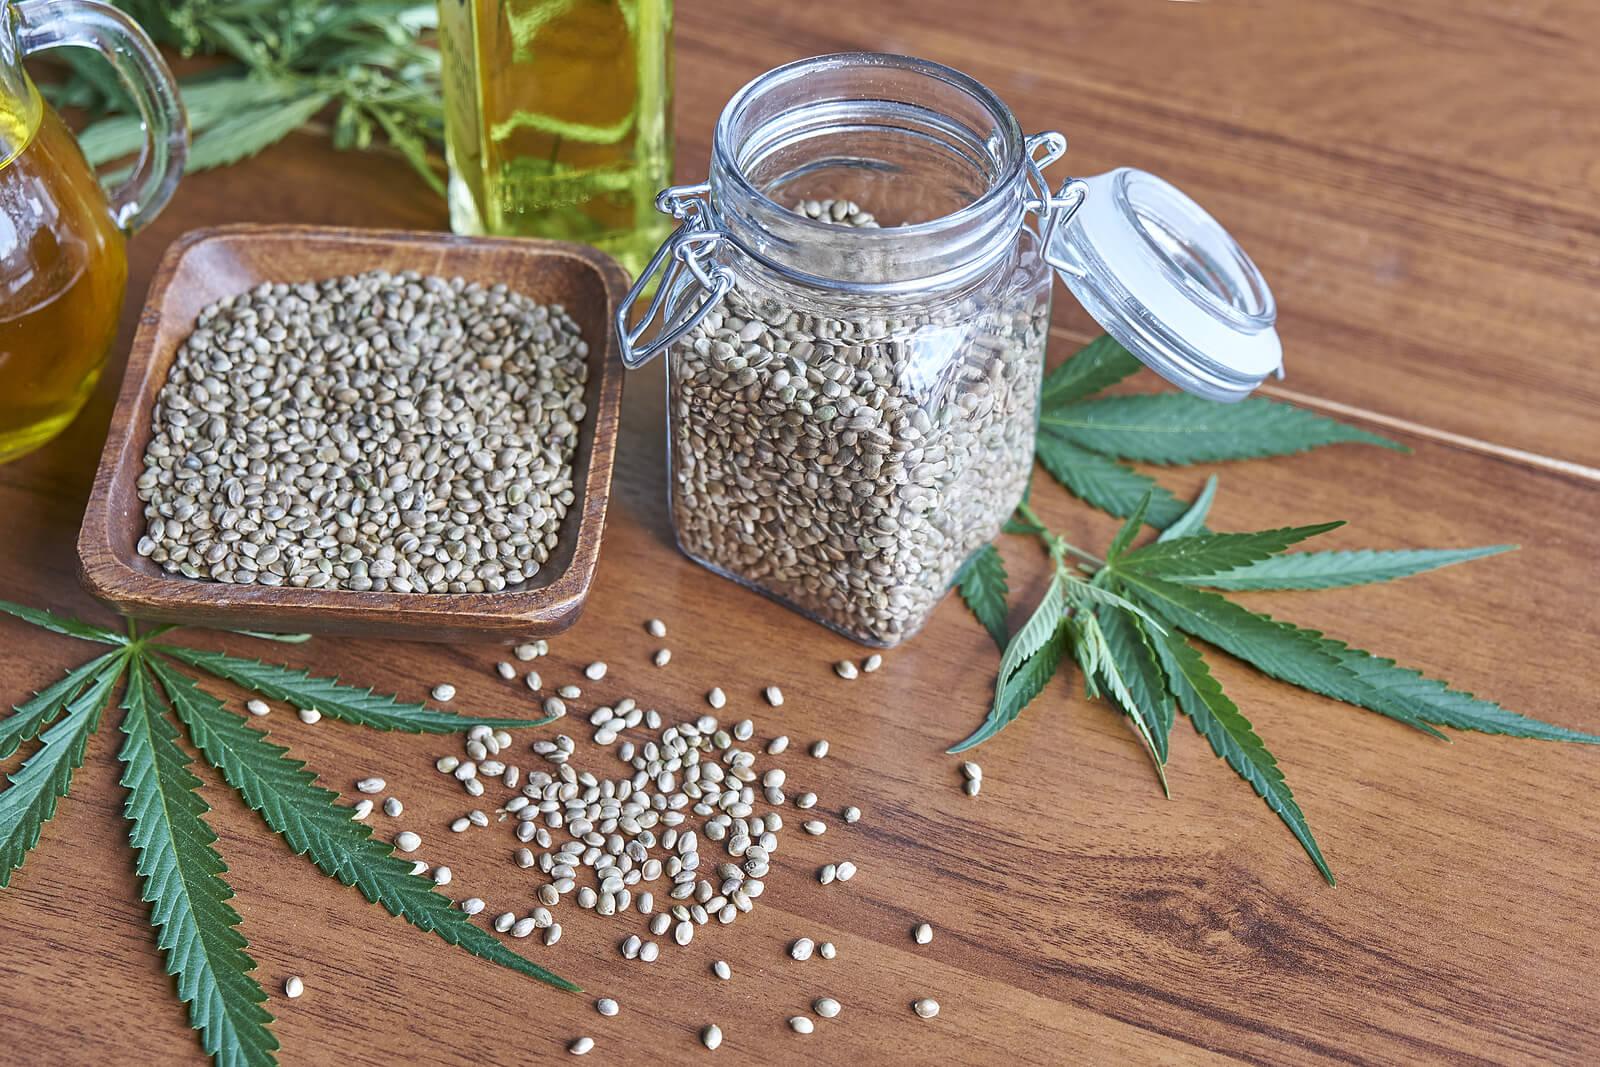 Buy Marijuana Seeds In Arizona